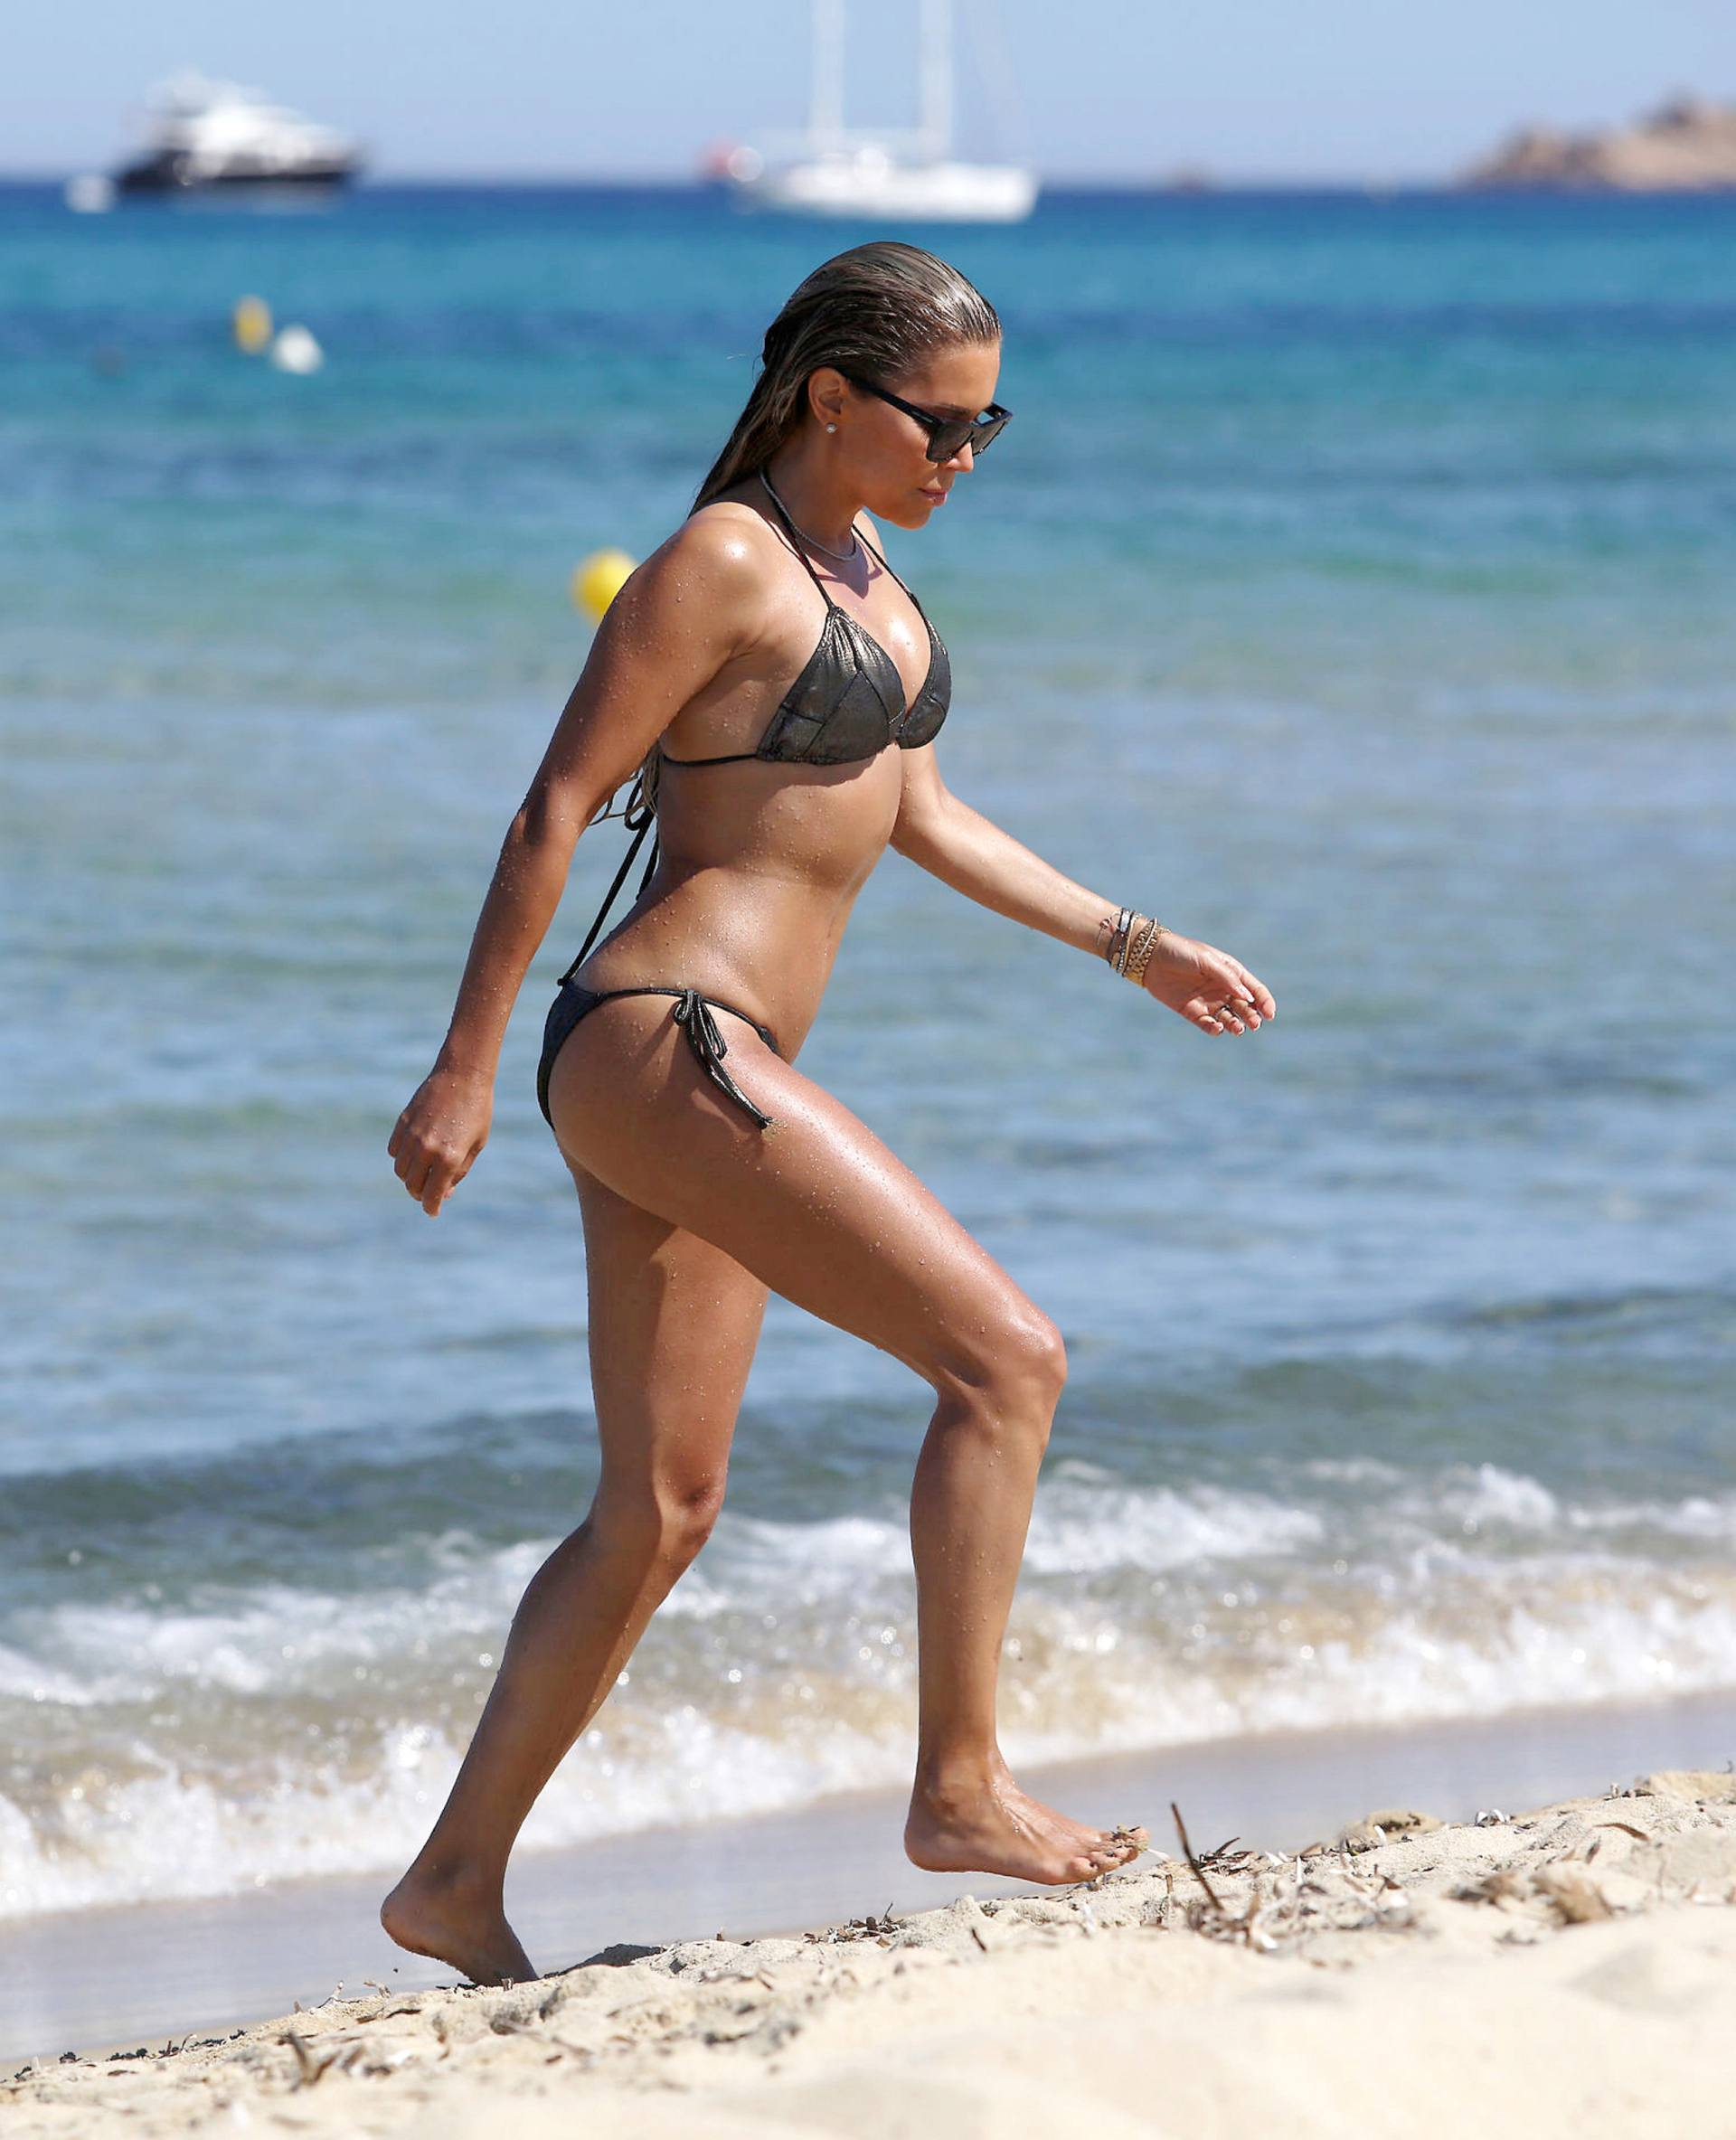 Sylvie Meis – Sexy Boobs In Bikini On The Beach In Saint Tropez 0008